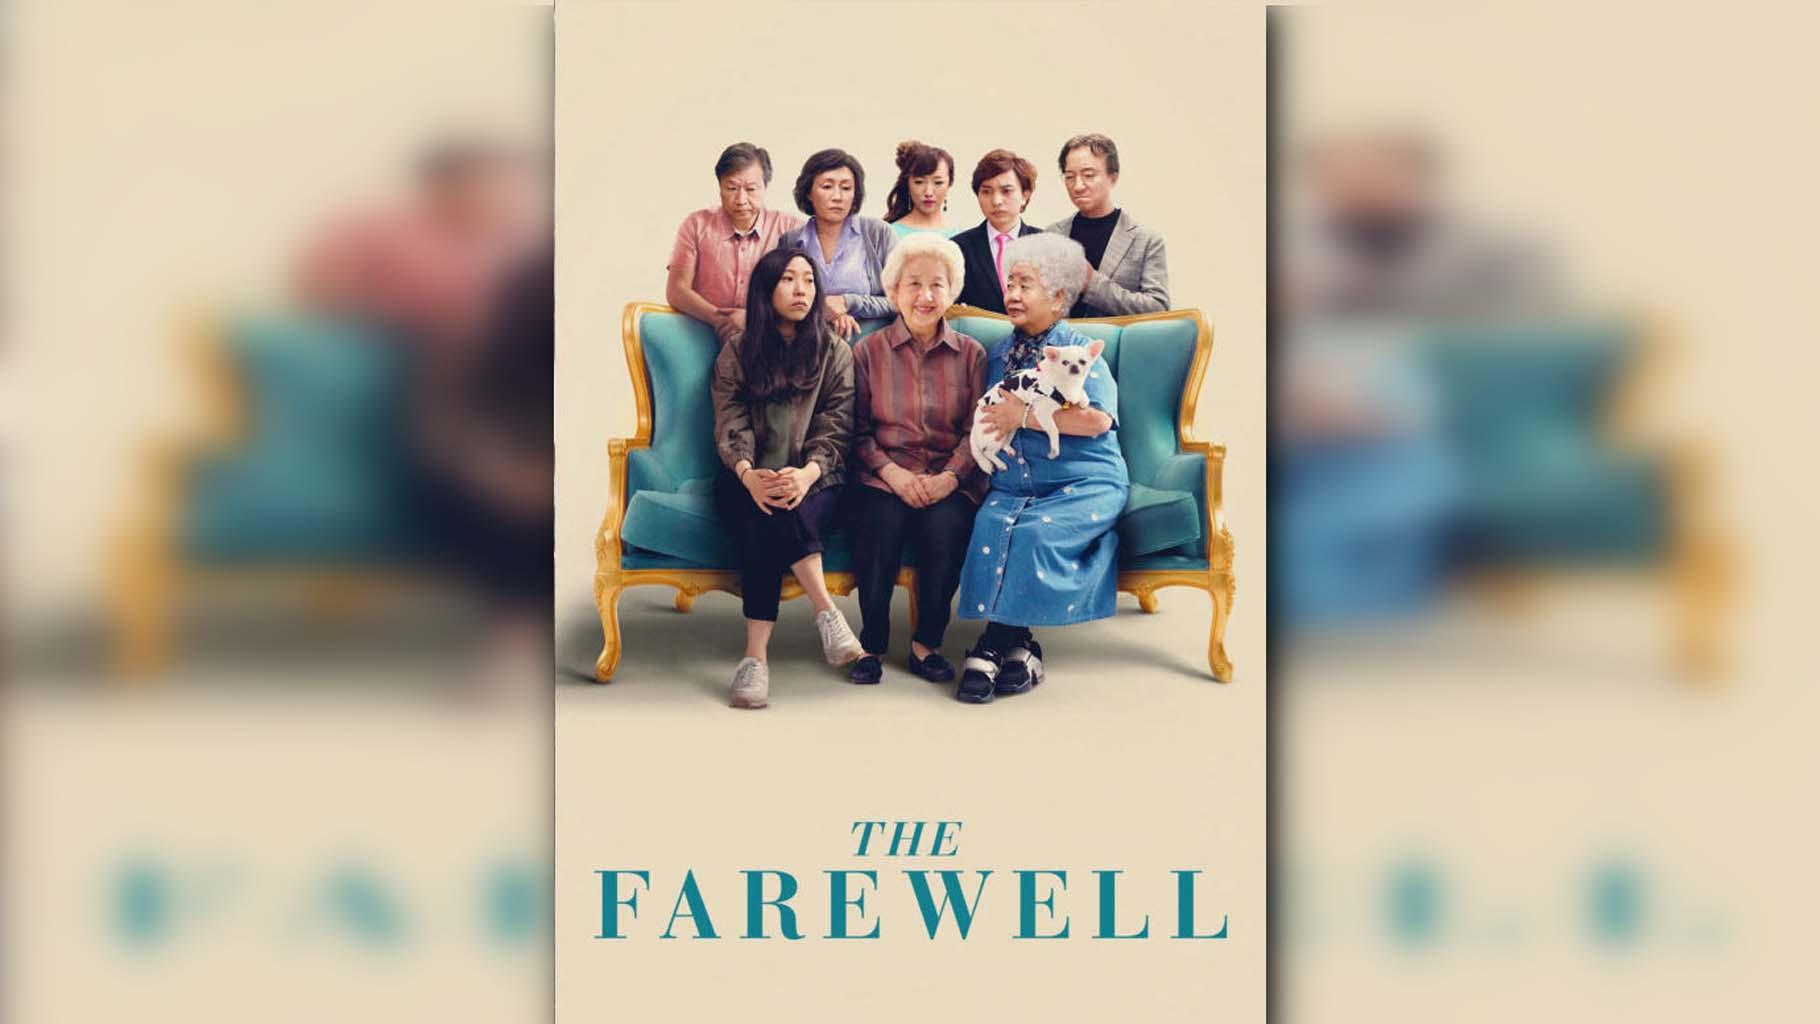 Family values, Lulu wang, The farewell, Dailyrecco